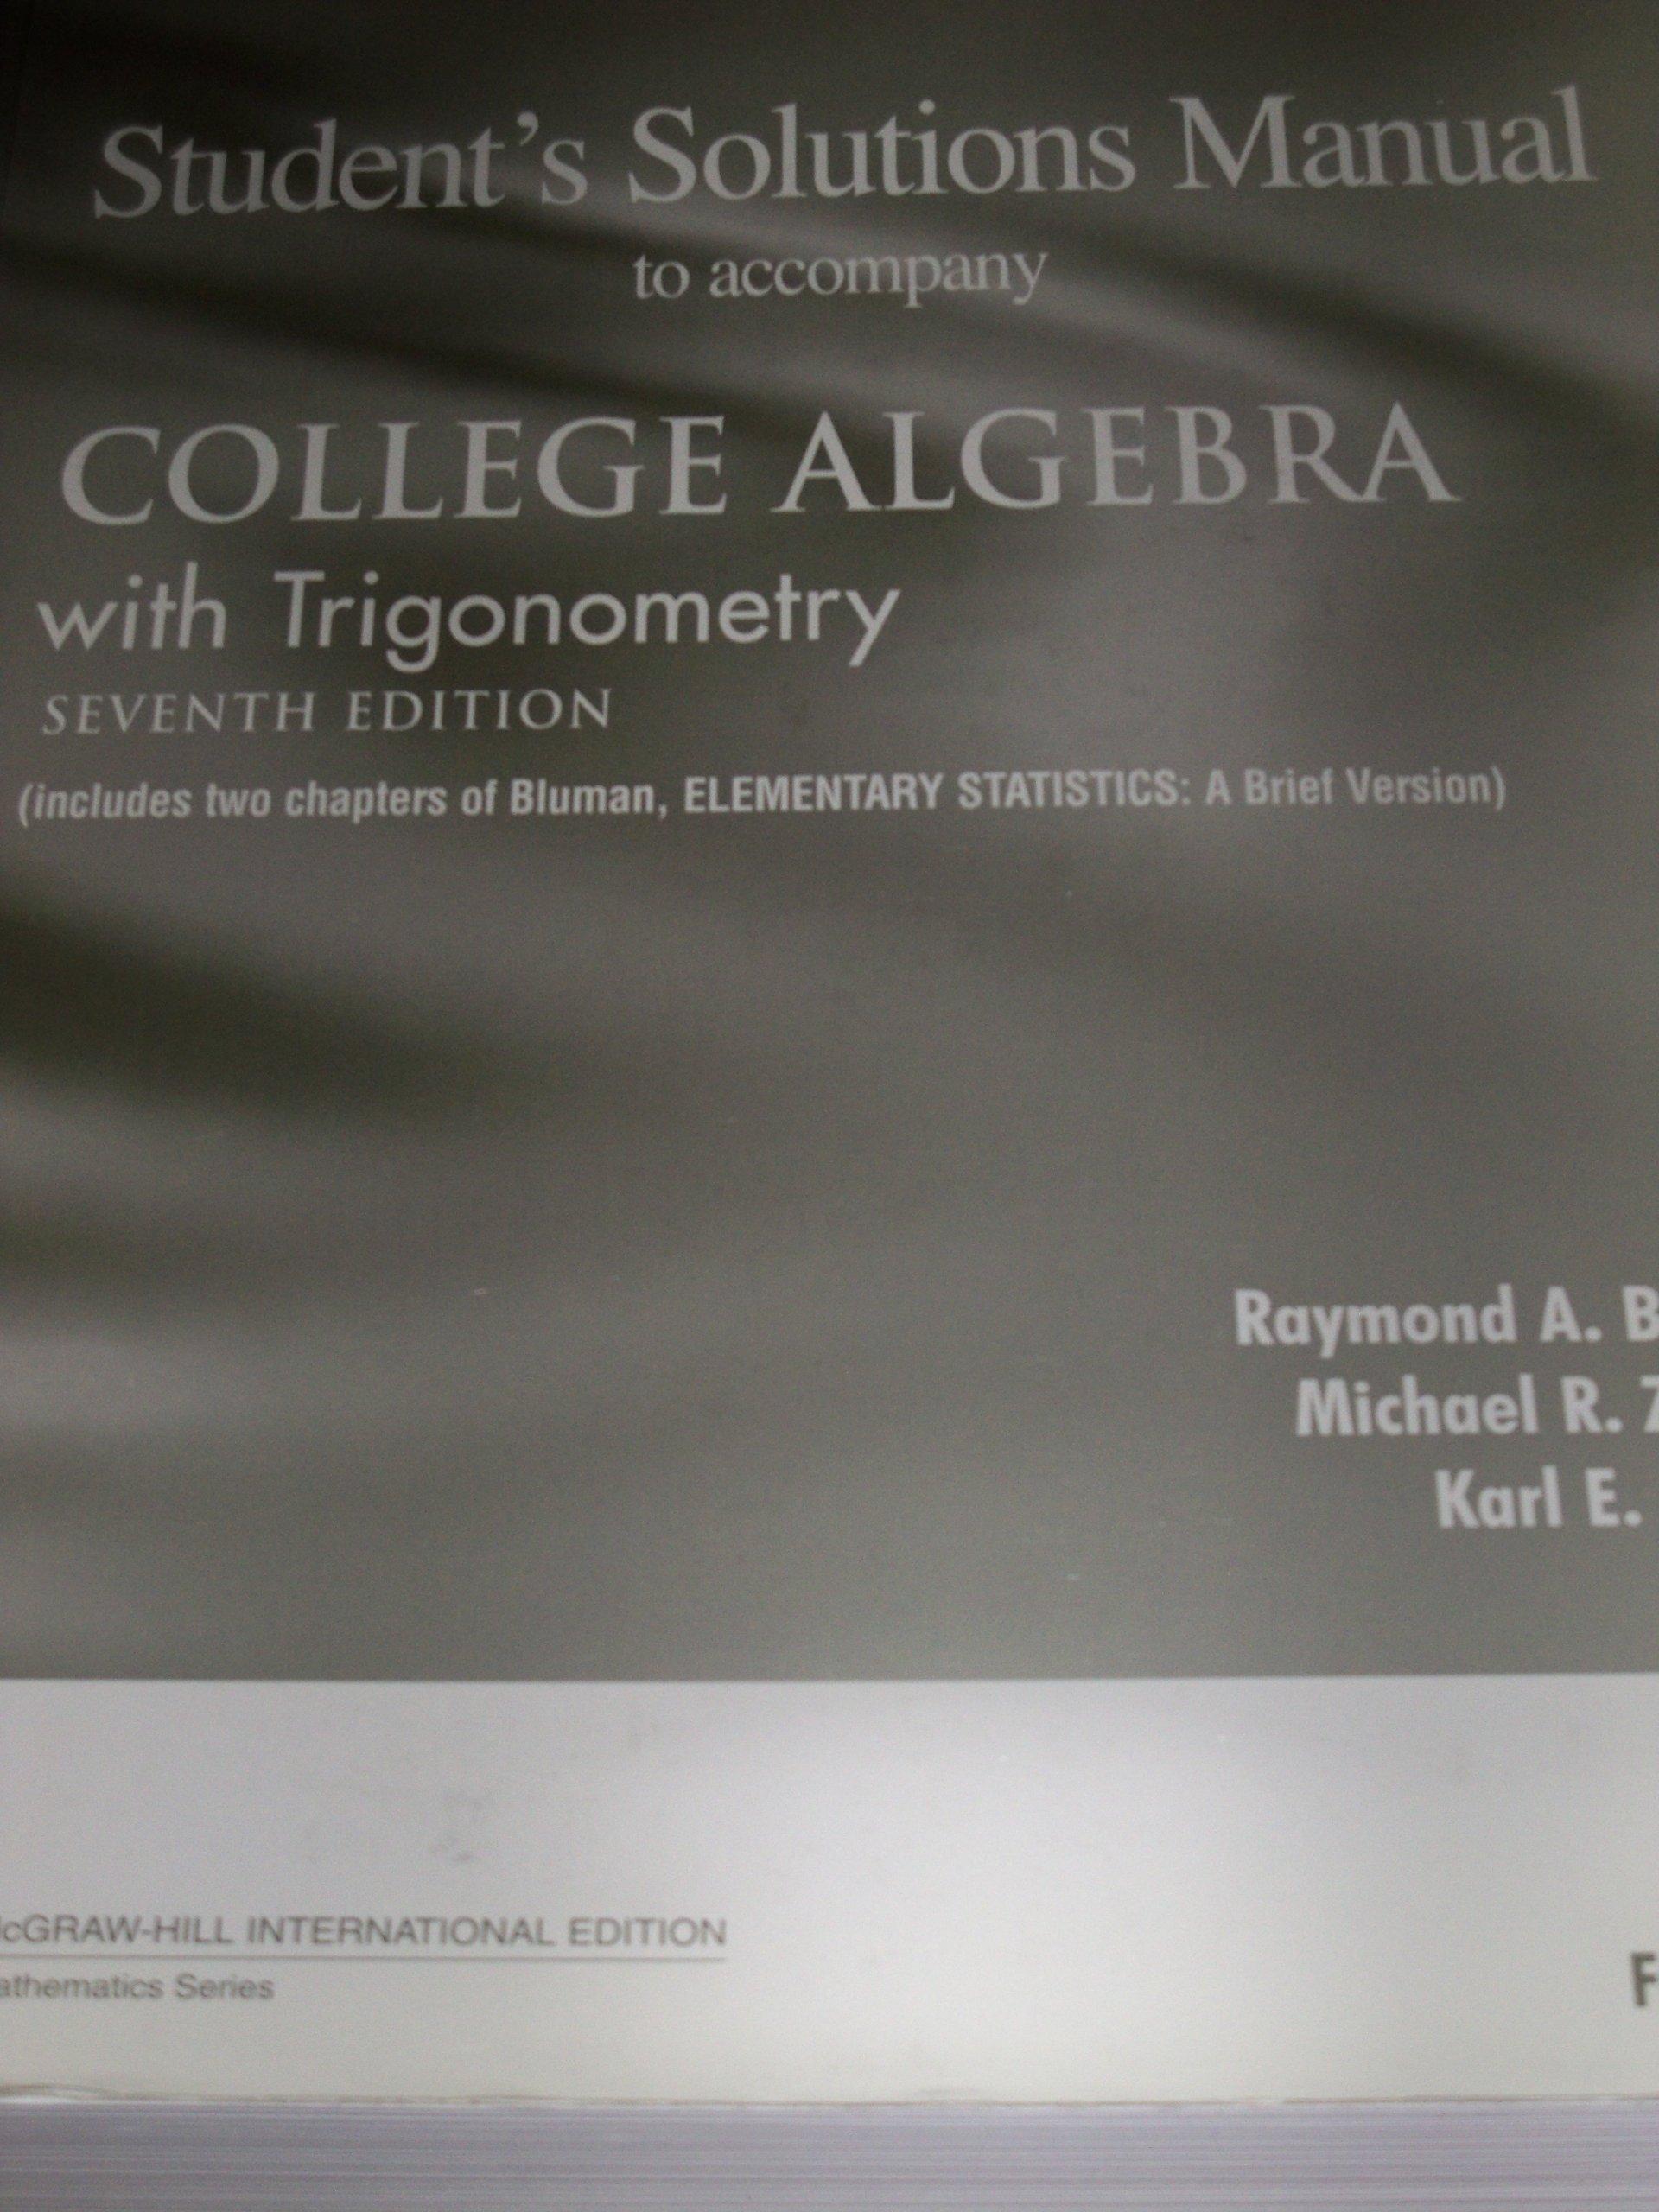 Student's Solutions Manual to Accompany College Algebra with Trigonometry  International Edition: Raymond A., Michael r. ziegler, Barnett:  9780071210706: ...